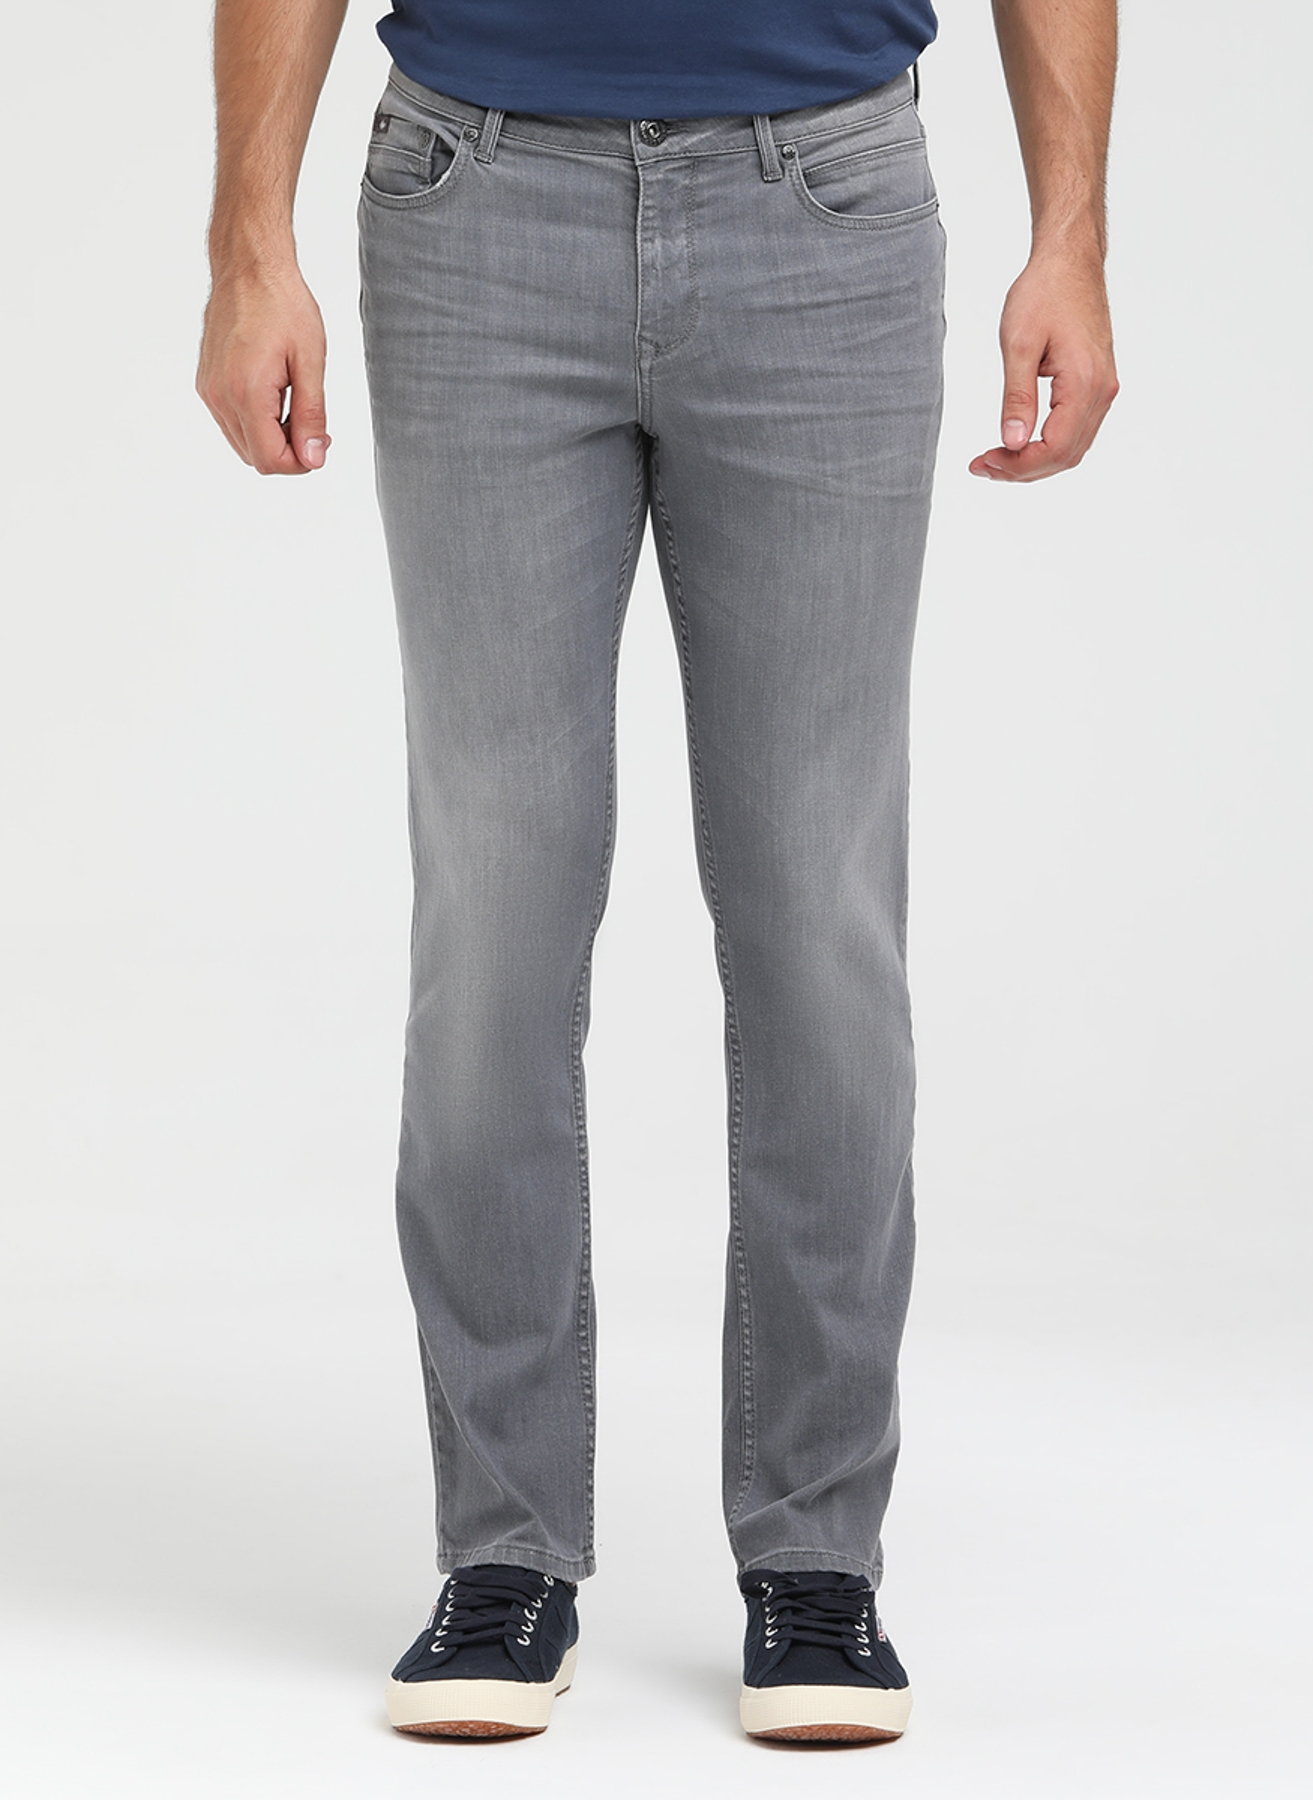 Lee Cooper Gri Klasik Pantolon 34-32 5000200284017 Ürün Resmi